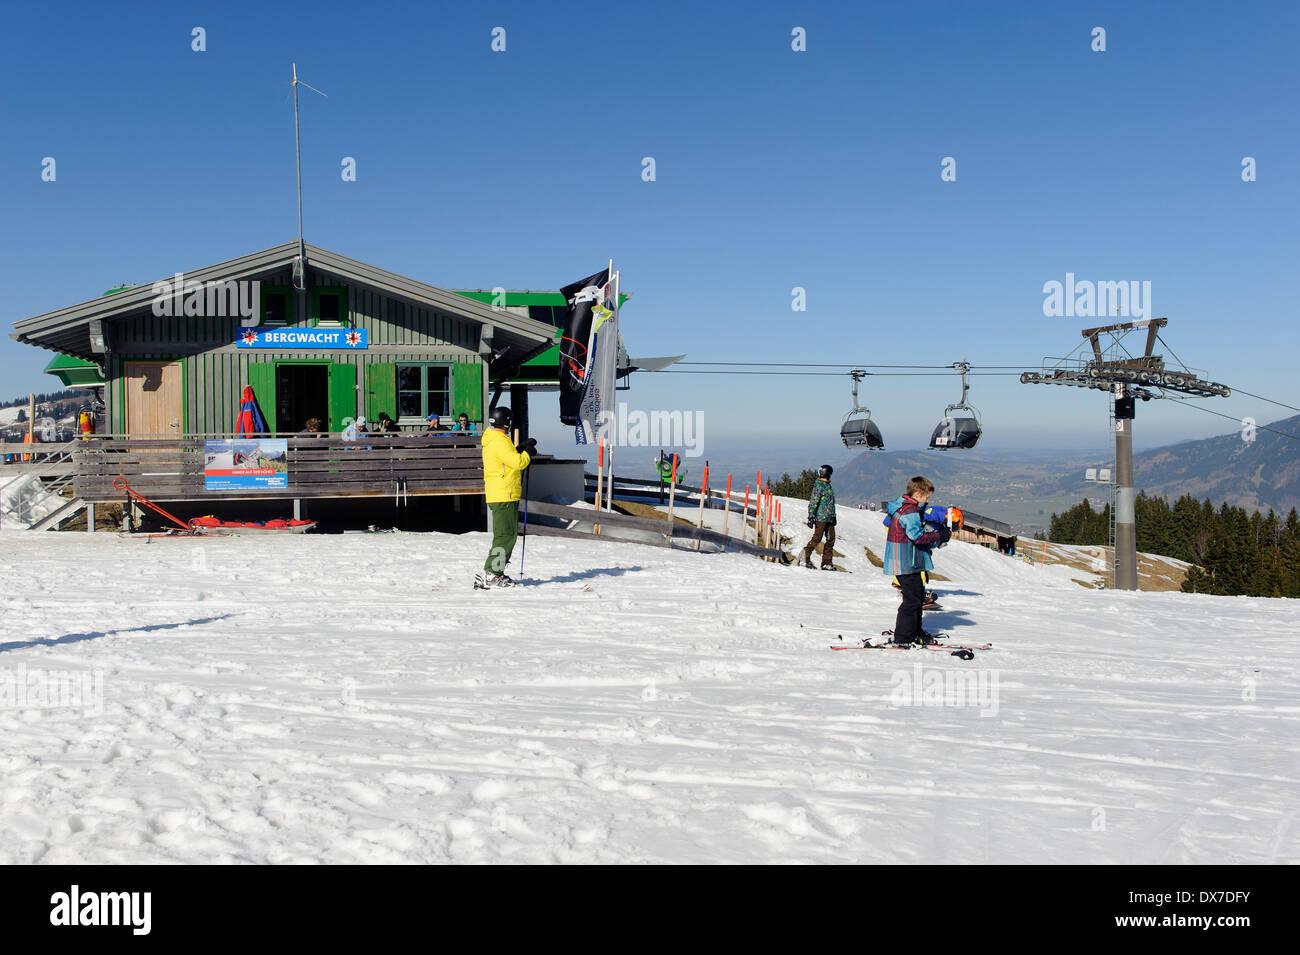 ski lift at ofterschwanger horn, allgäu, bavaria, germany stock